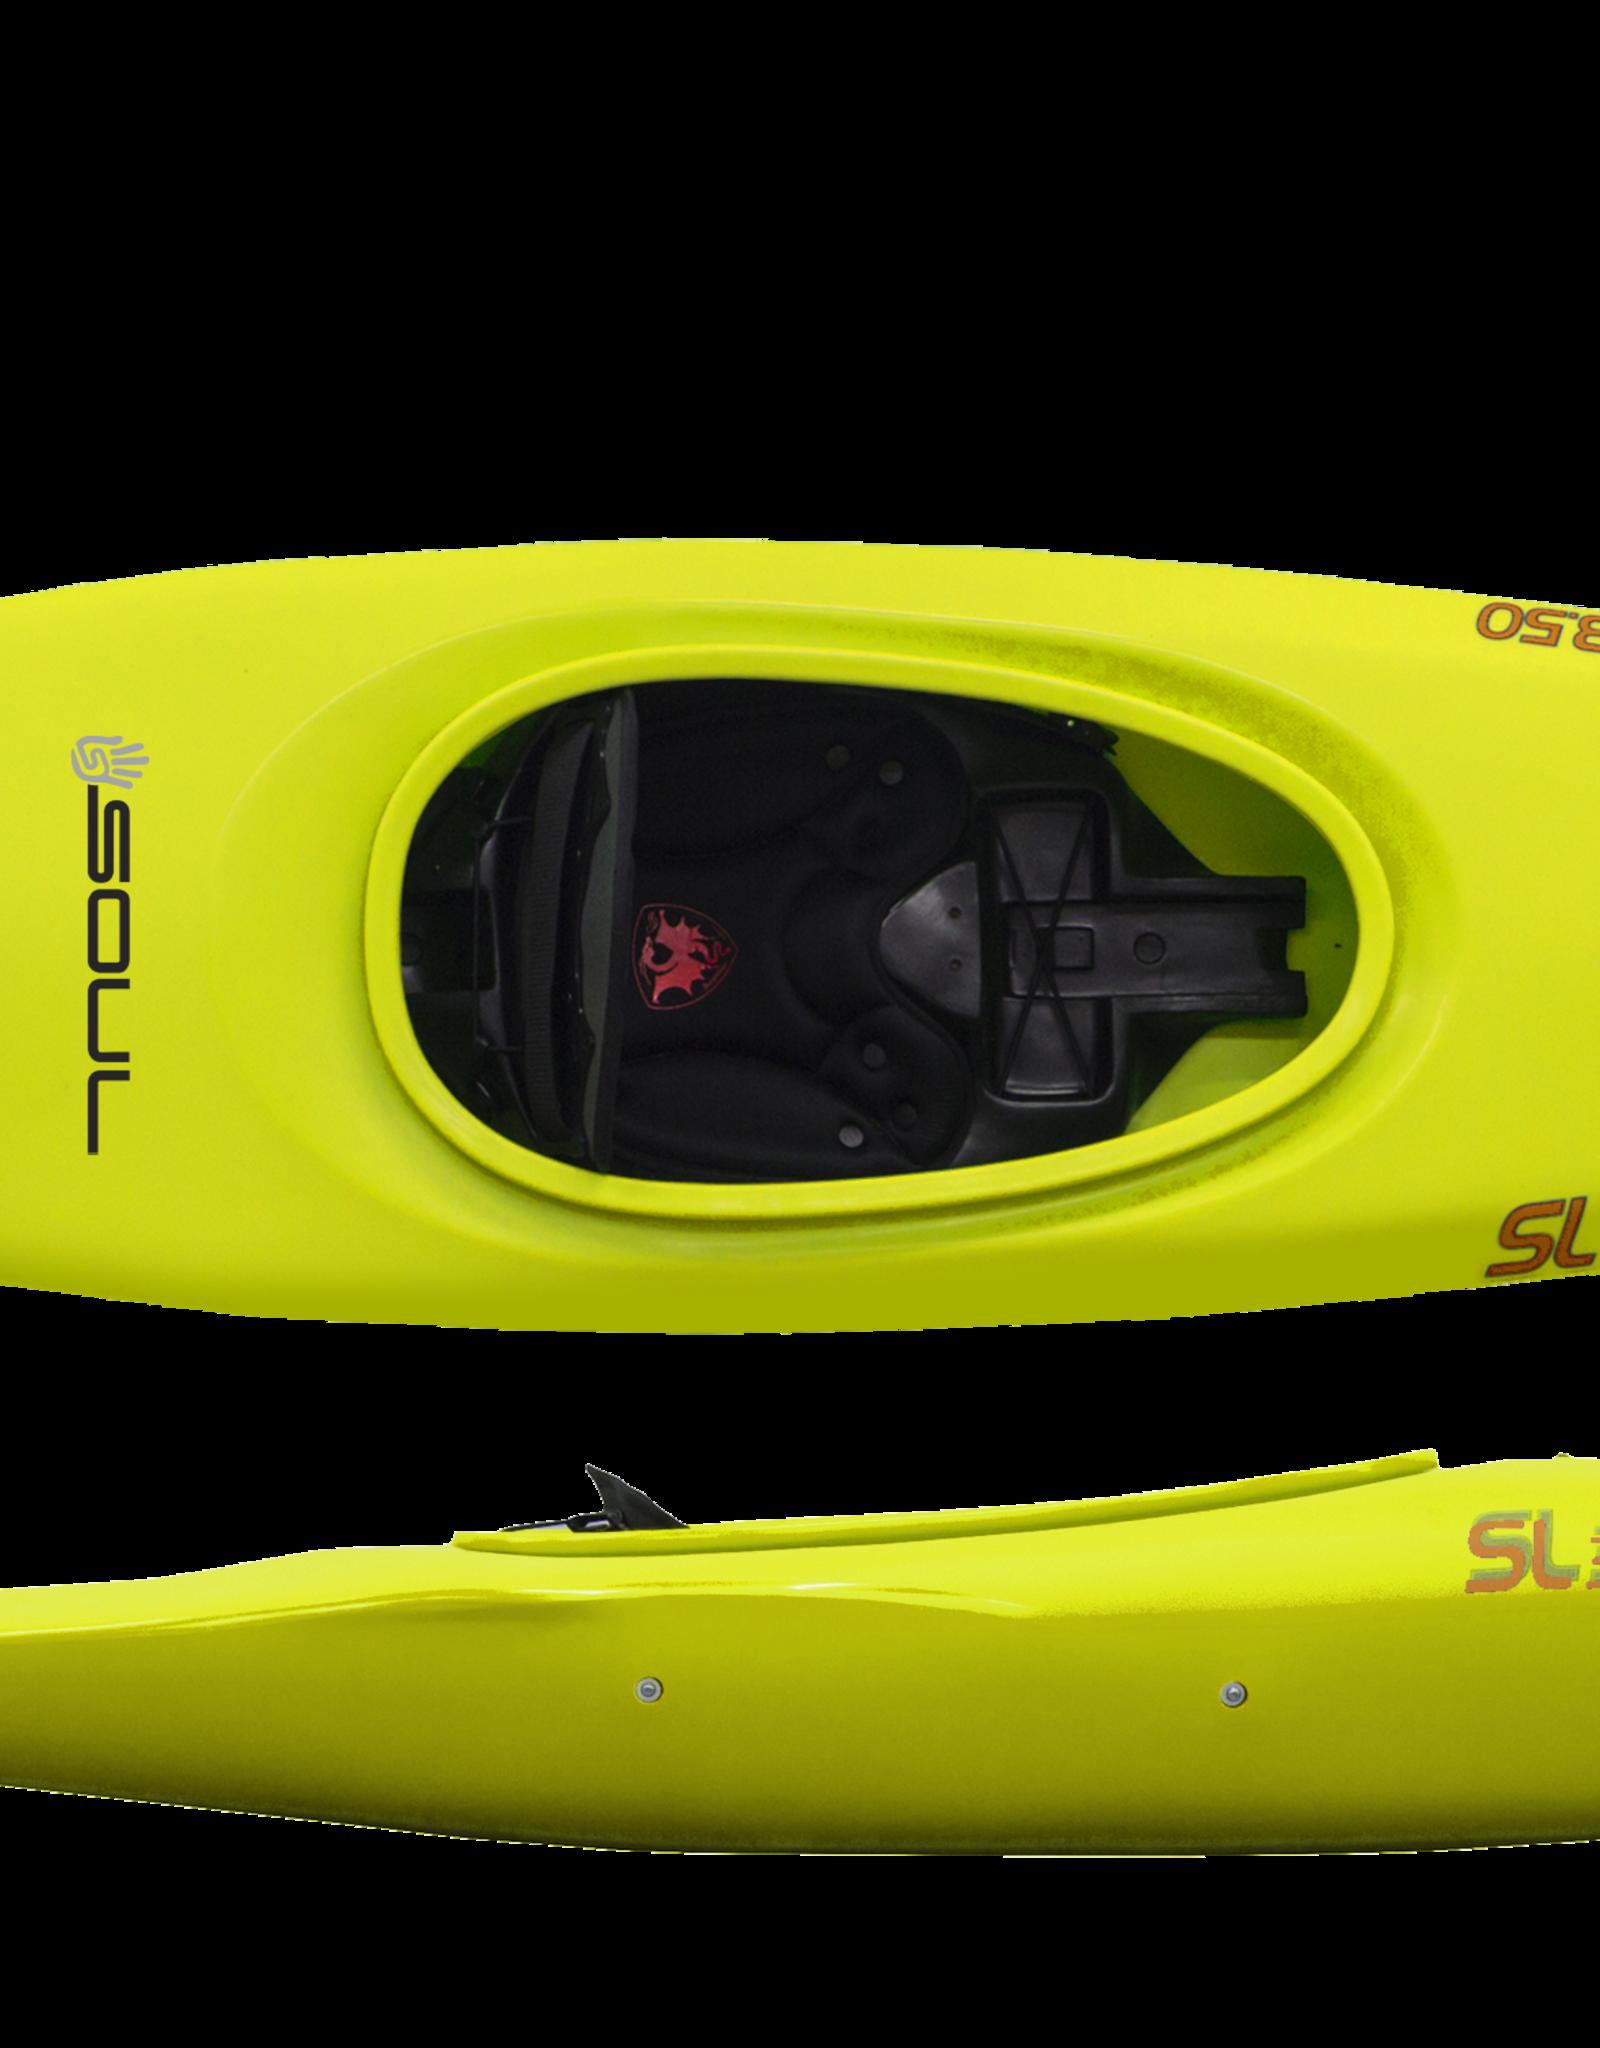 Dragorossi Dragorossi SL350